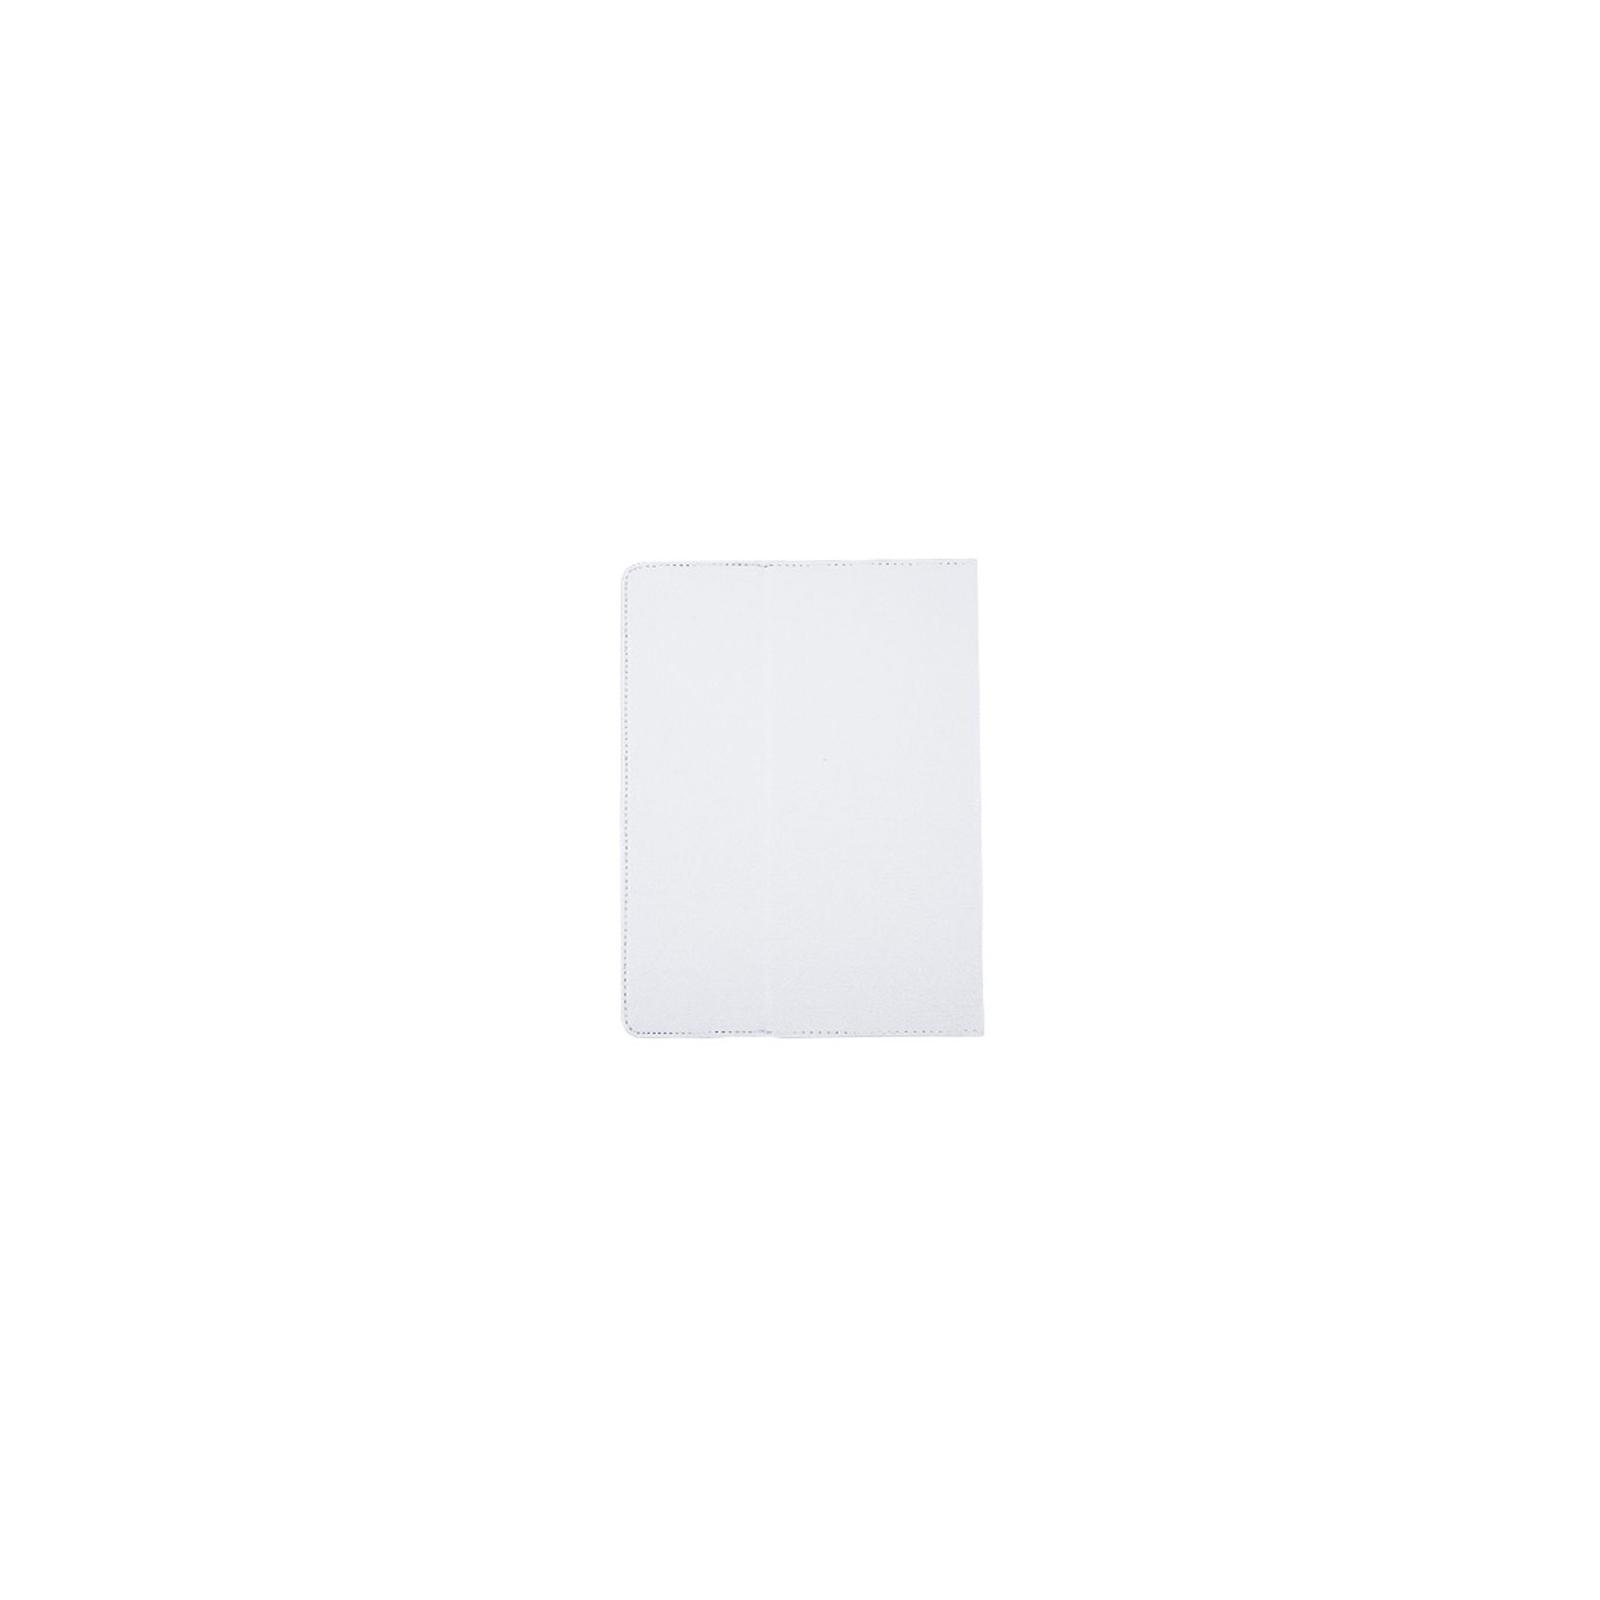 "Чехол для планшета Drobak 7""-8"" Universal Stand White (216891) изображение 3"